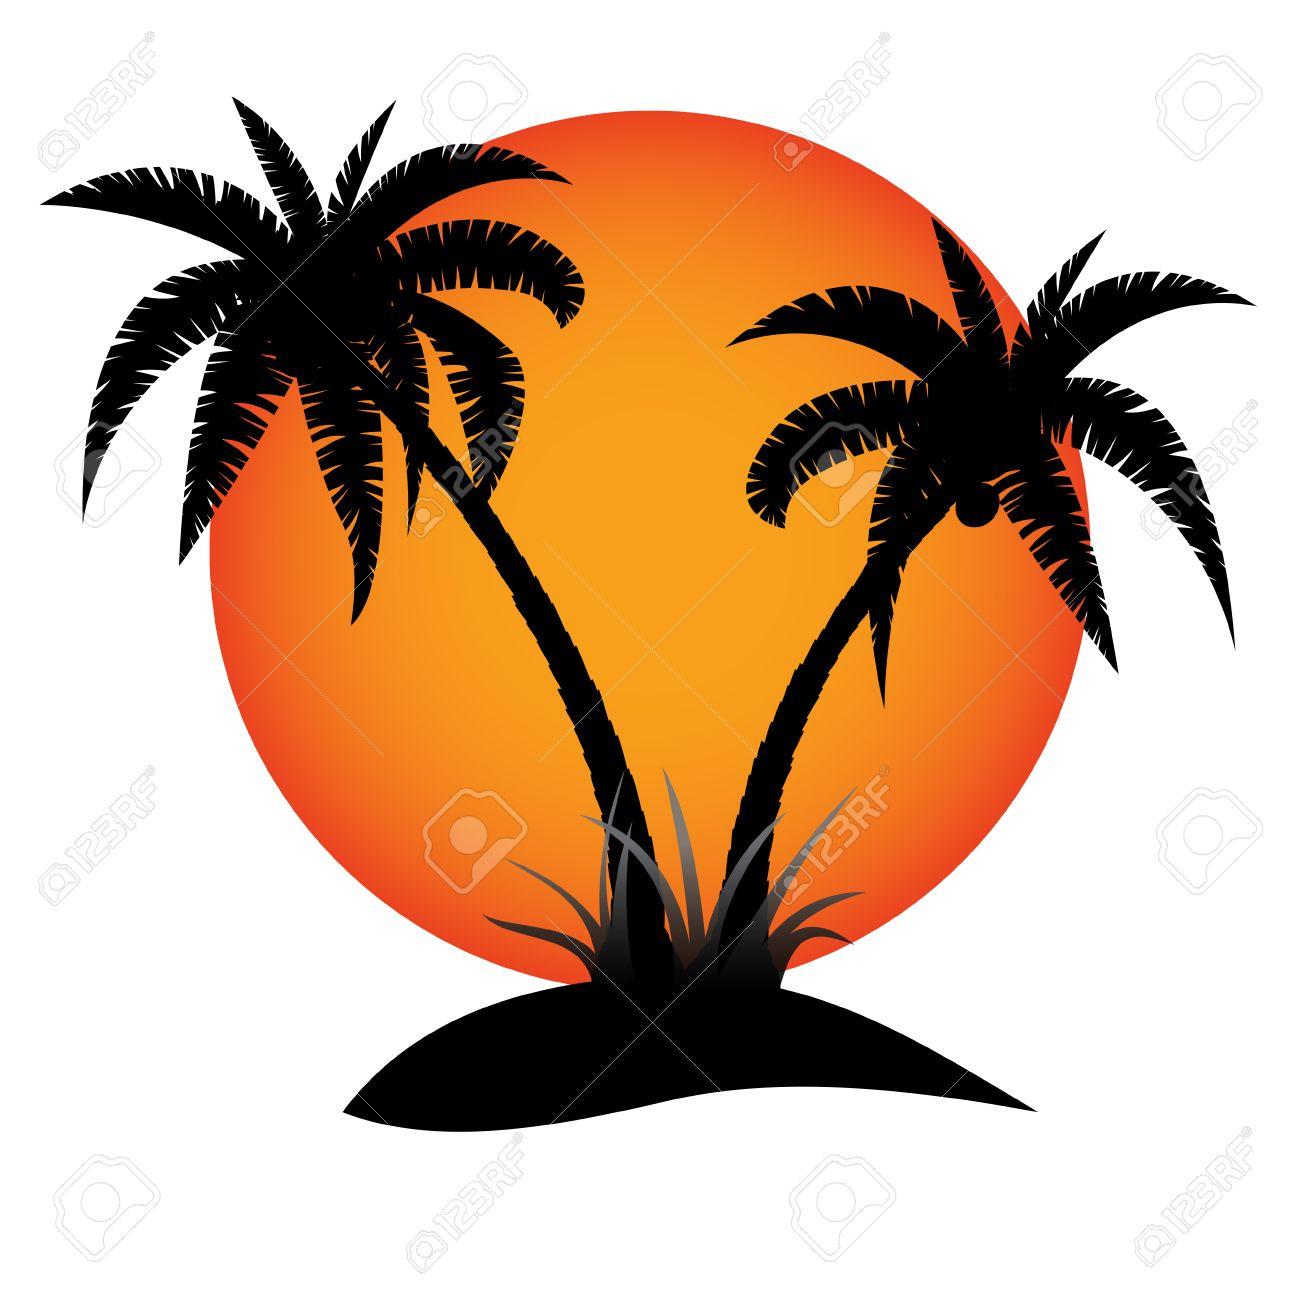 palm trees silhouette with sun on tropical island royalty free rh 123rf com